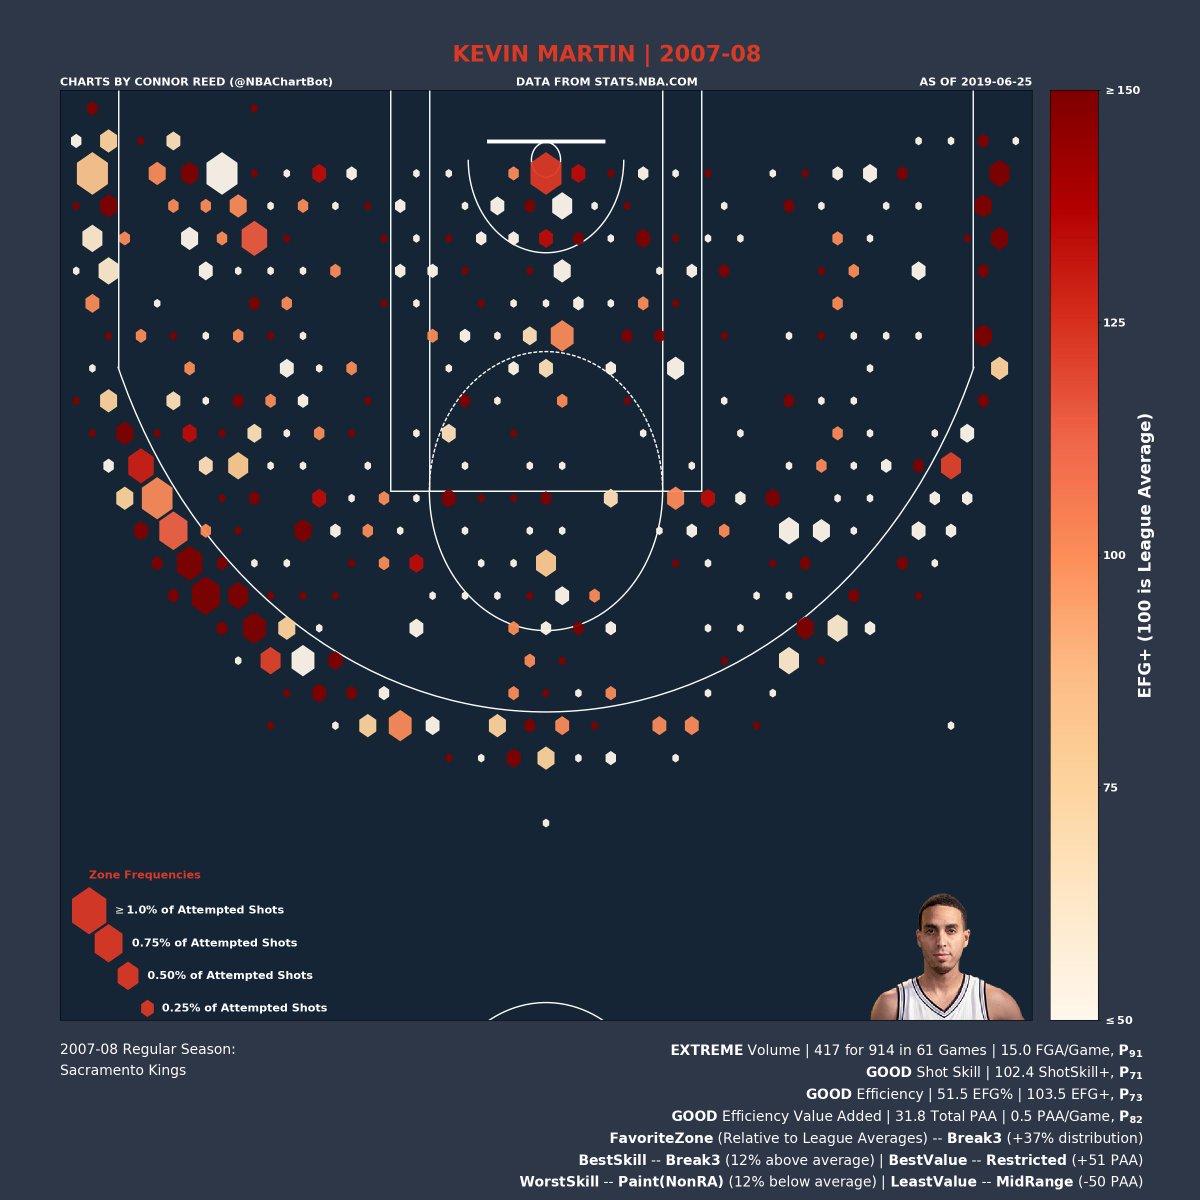 Kevin Martin's 2007-08 Shot Chart:  Volume: EXTREME   P_91 (percentile) Shot Skill: GOOD   P_71 Efficiency: GOOD   P_73 Efficiency Value: GOOD   P_82  Favorite Zone: Break3 Best Skill Zone: Break3 Best Value Zone: Restricted  #KevinMartin #Kings #SacramentoProud